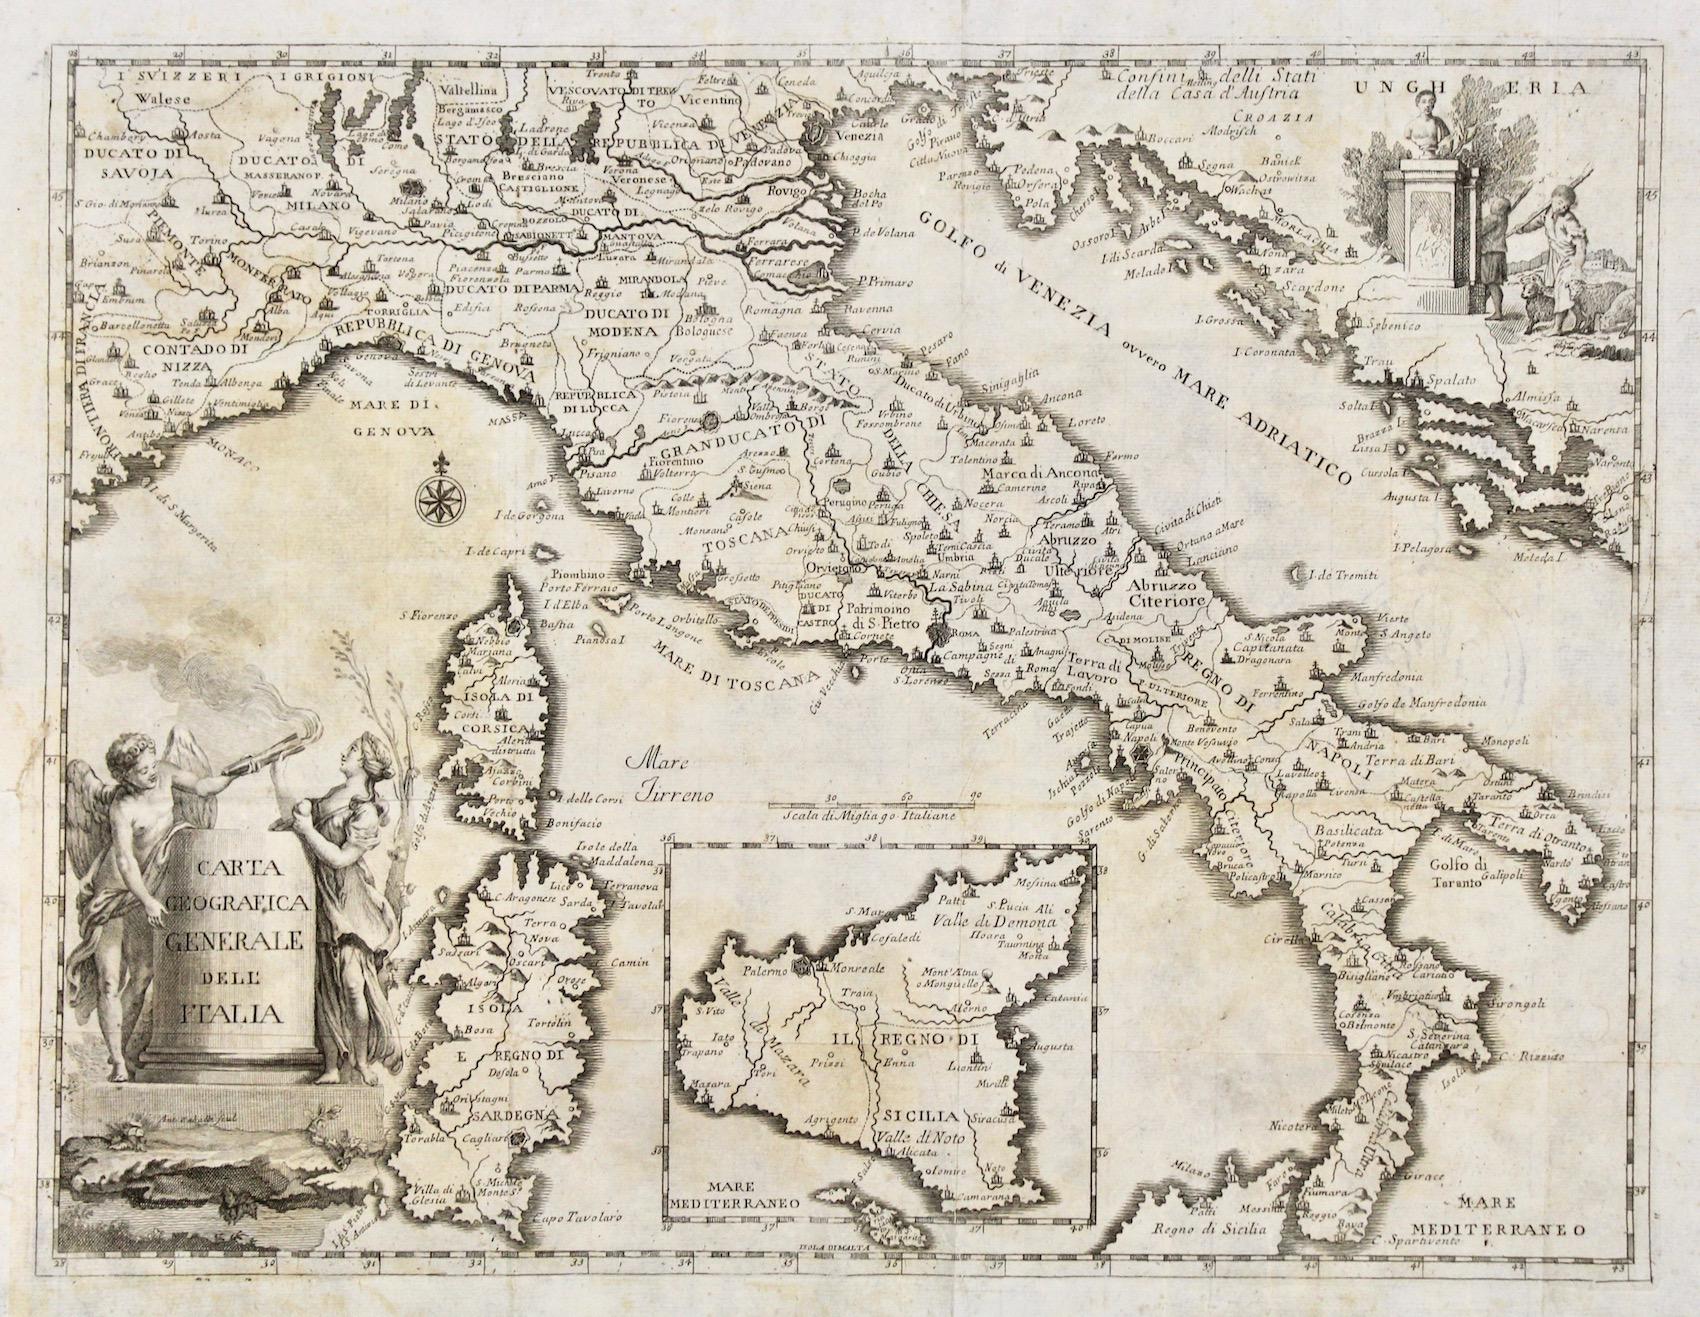 Cartina Geografica Italia Hd.Carta Geografica Generale Dell Italia Da Orlandi Cesare 1770 Arte Nbsp Nbsp Stampa Nbsp Nbsp Poster Libreria Antiquaria Perini Sas Di Perini